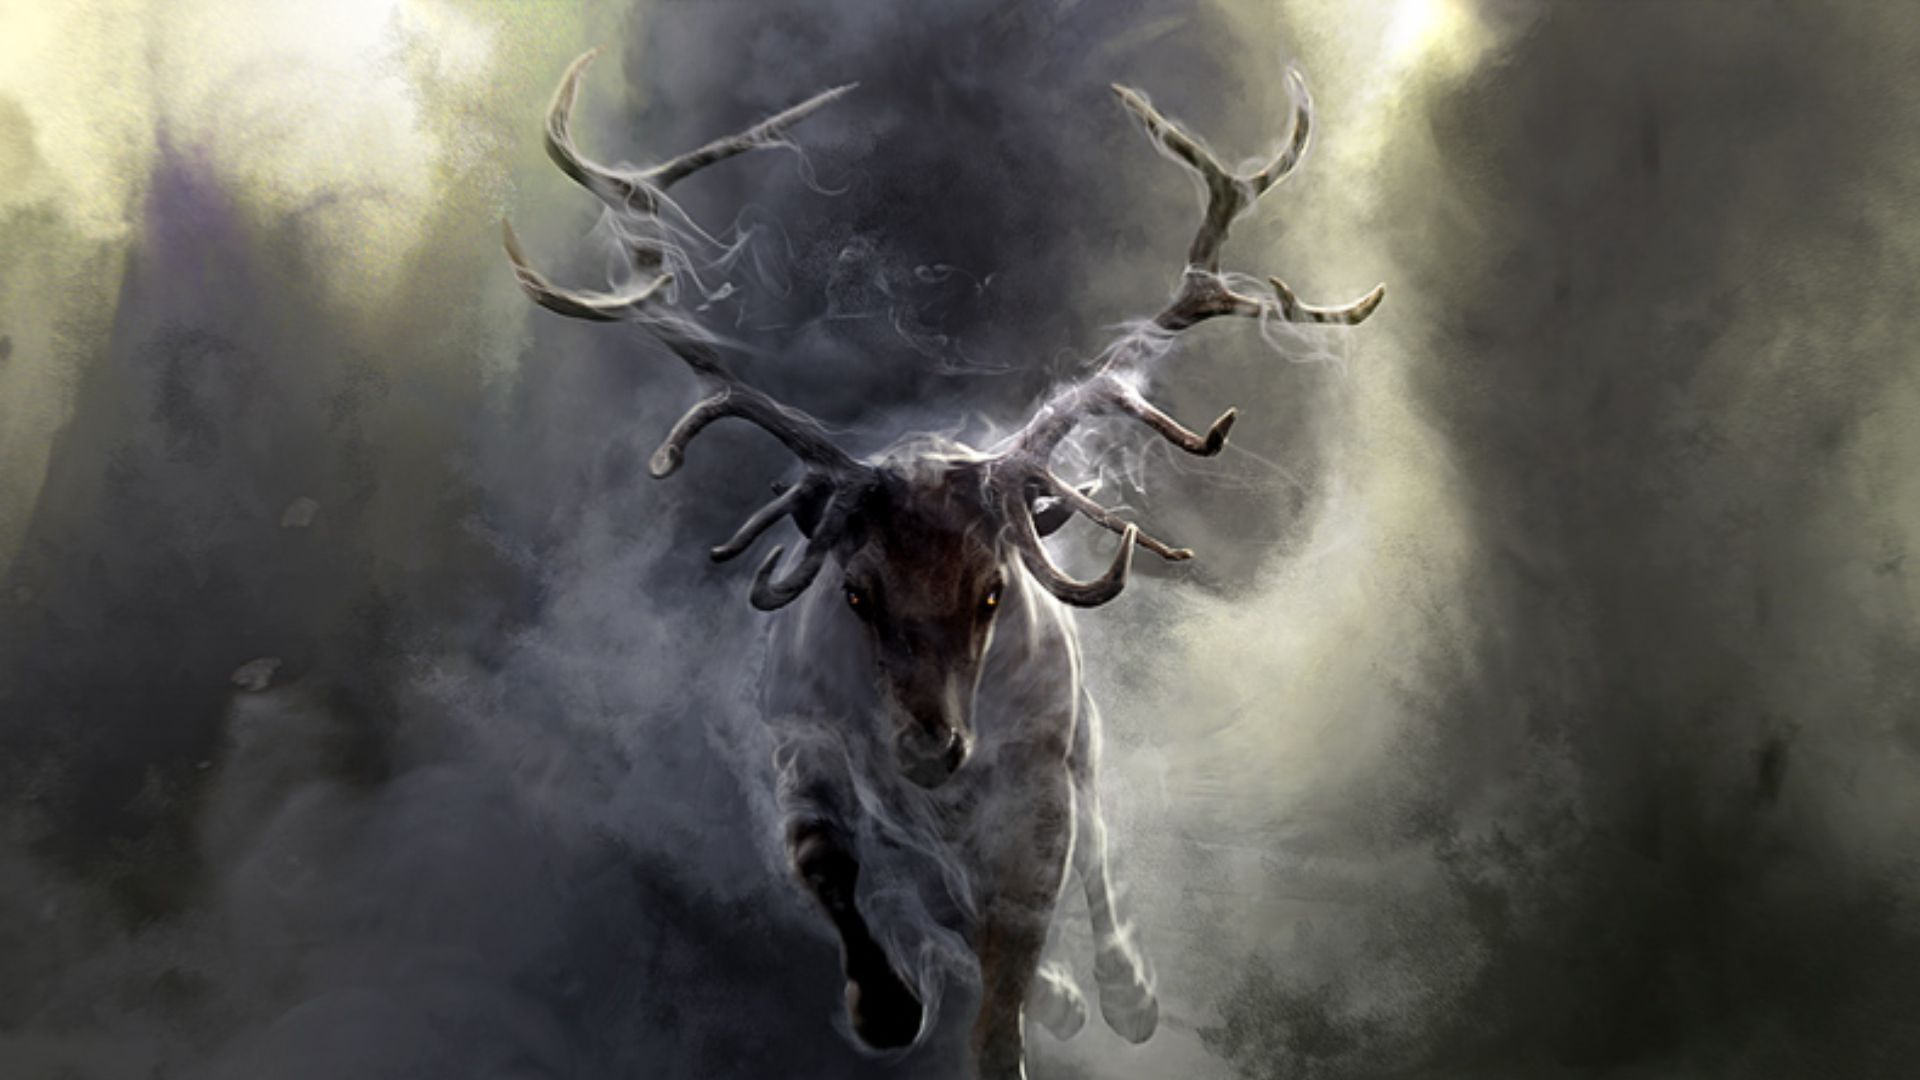 finest selection 95683 6a968 Download Wallpaper 1920x1080 Deer, Smoke, Run, Horns Full HD 1080p HD  Background